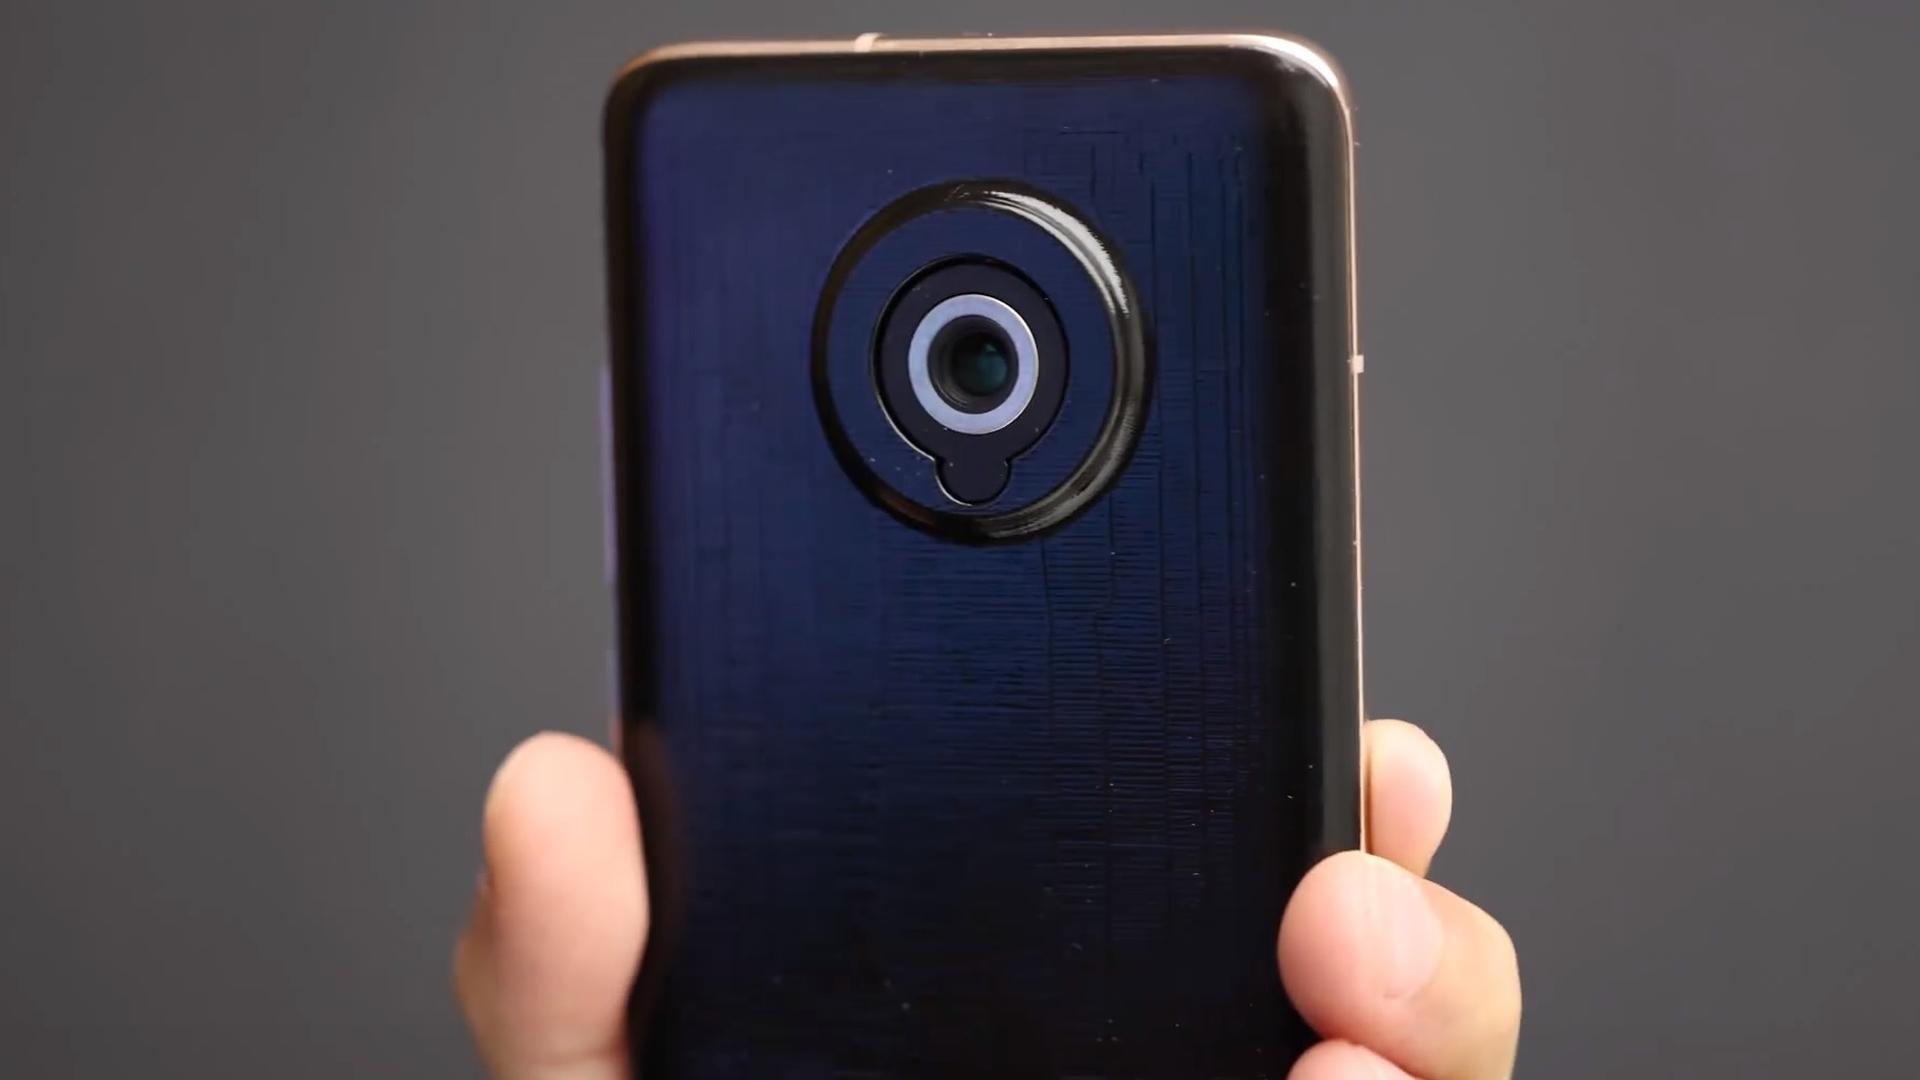 xiaomi telephoto lens phone 1